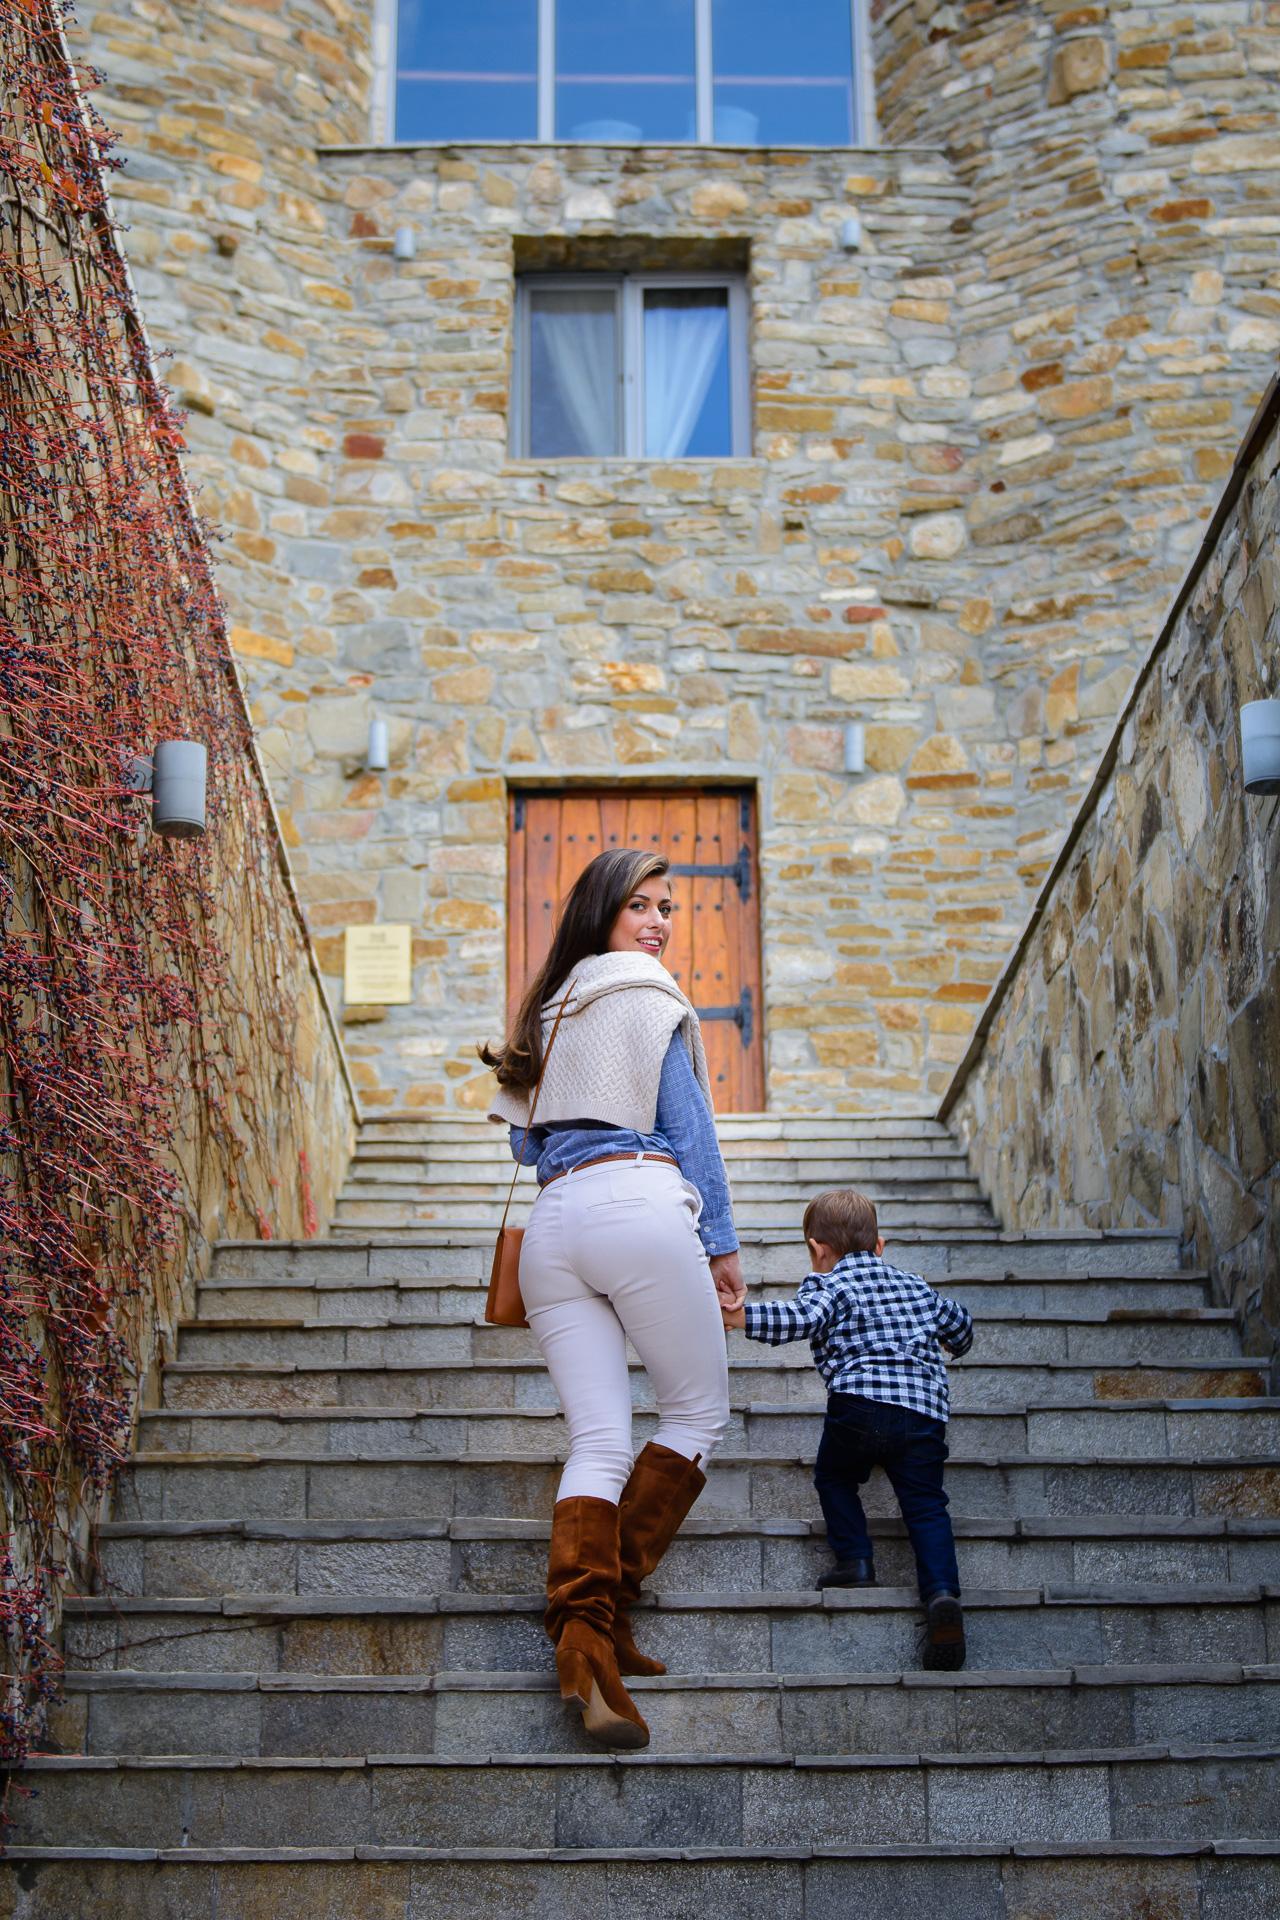 Chateau Copsa one day trip 2016